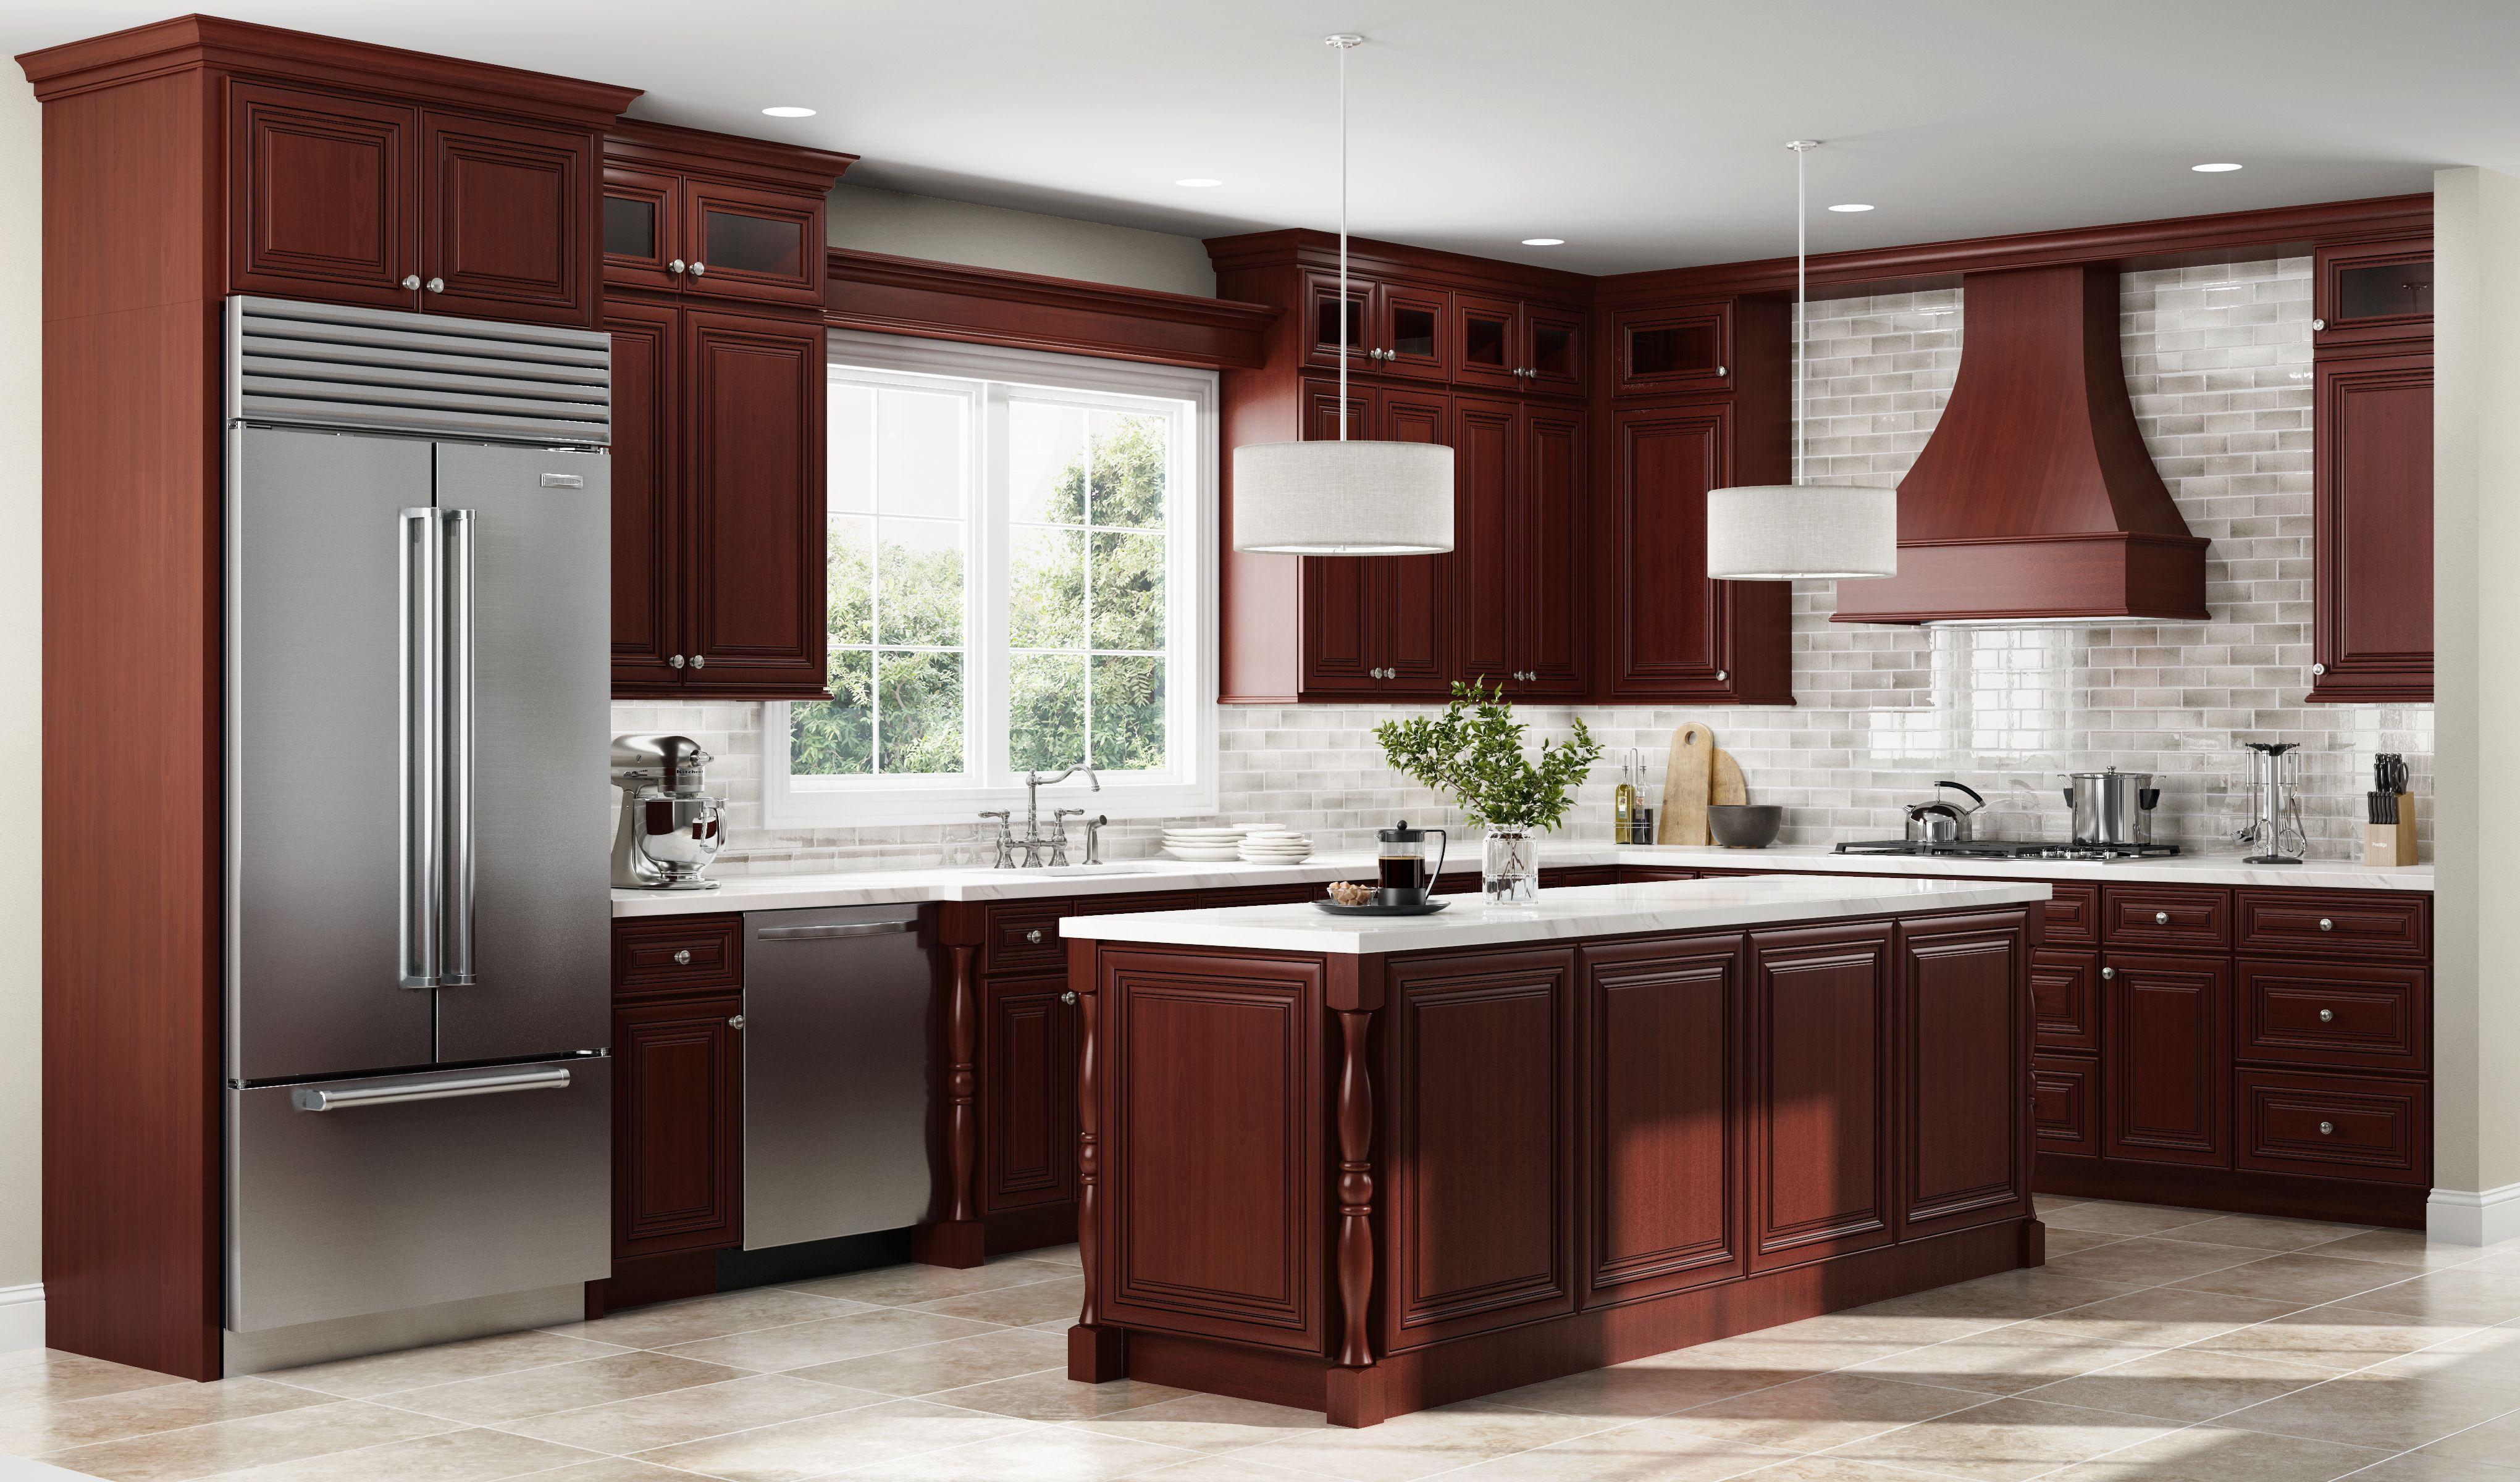 Gorgeous Kitchen Design Ideas For Cherry Cabinets In 2020 Kitchen Design Cherry Cabinets Kitchen Cherry Cabinets